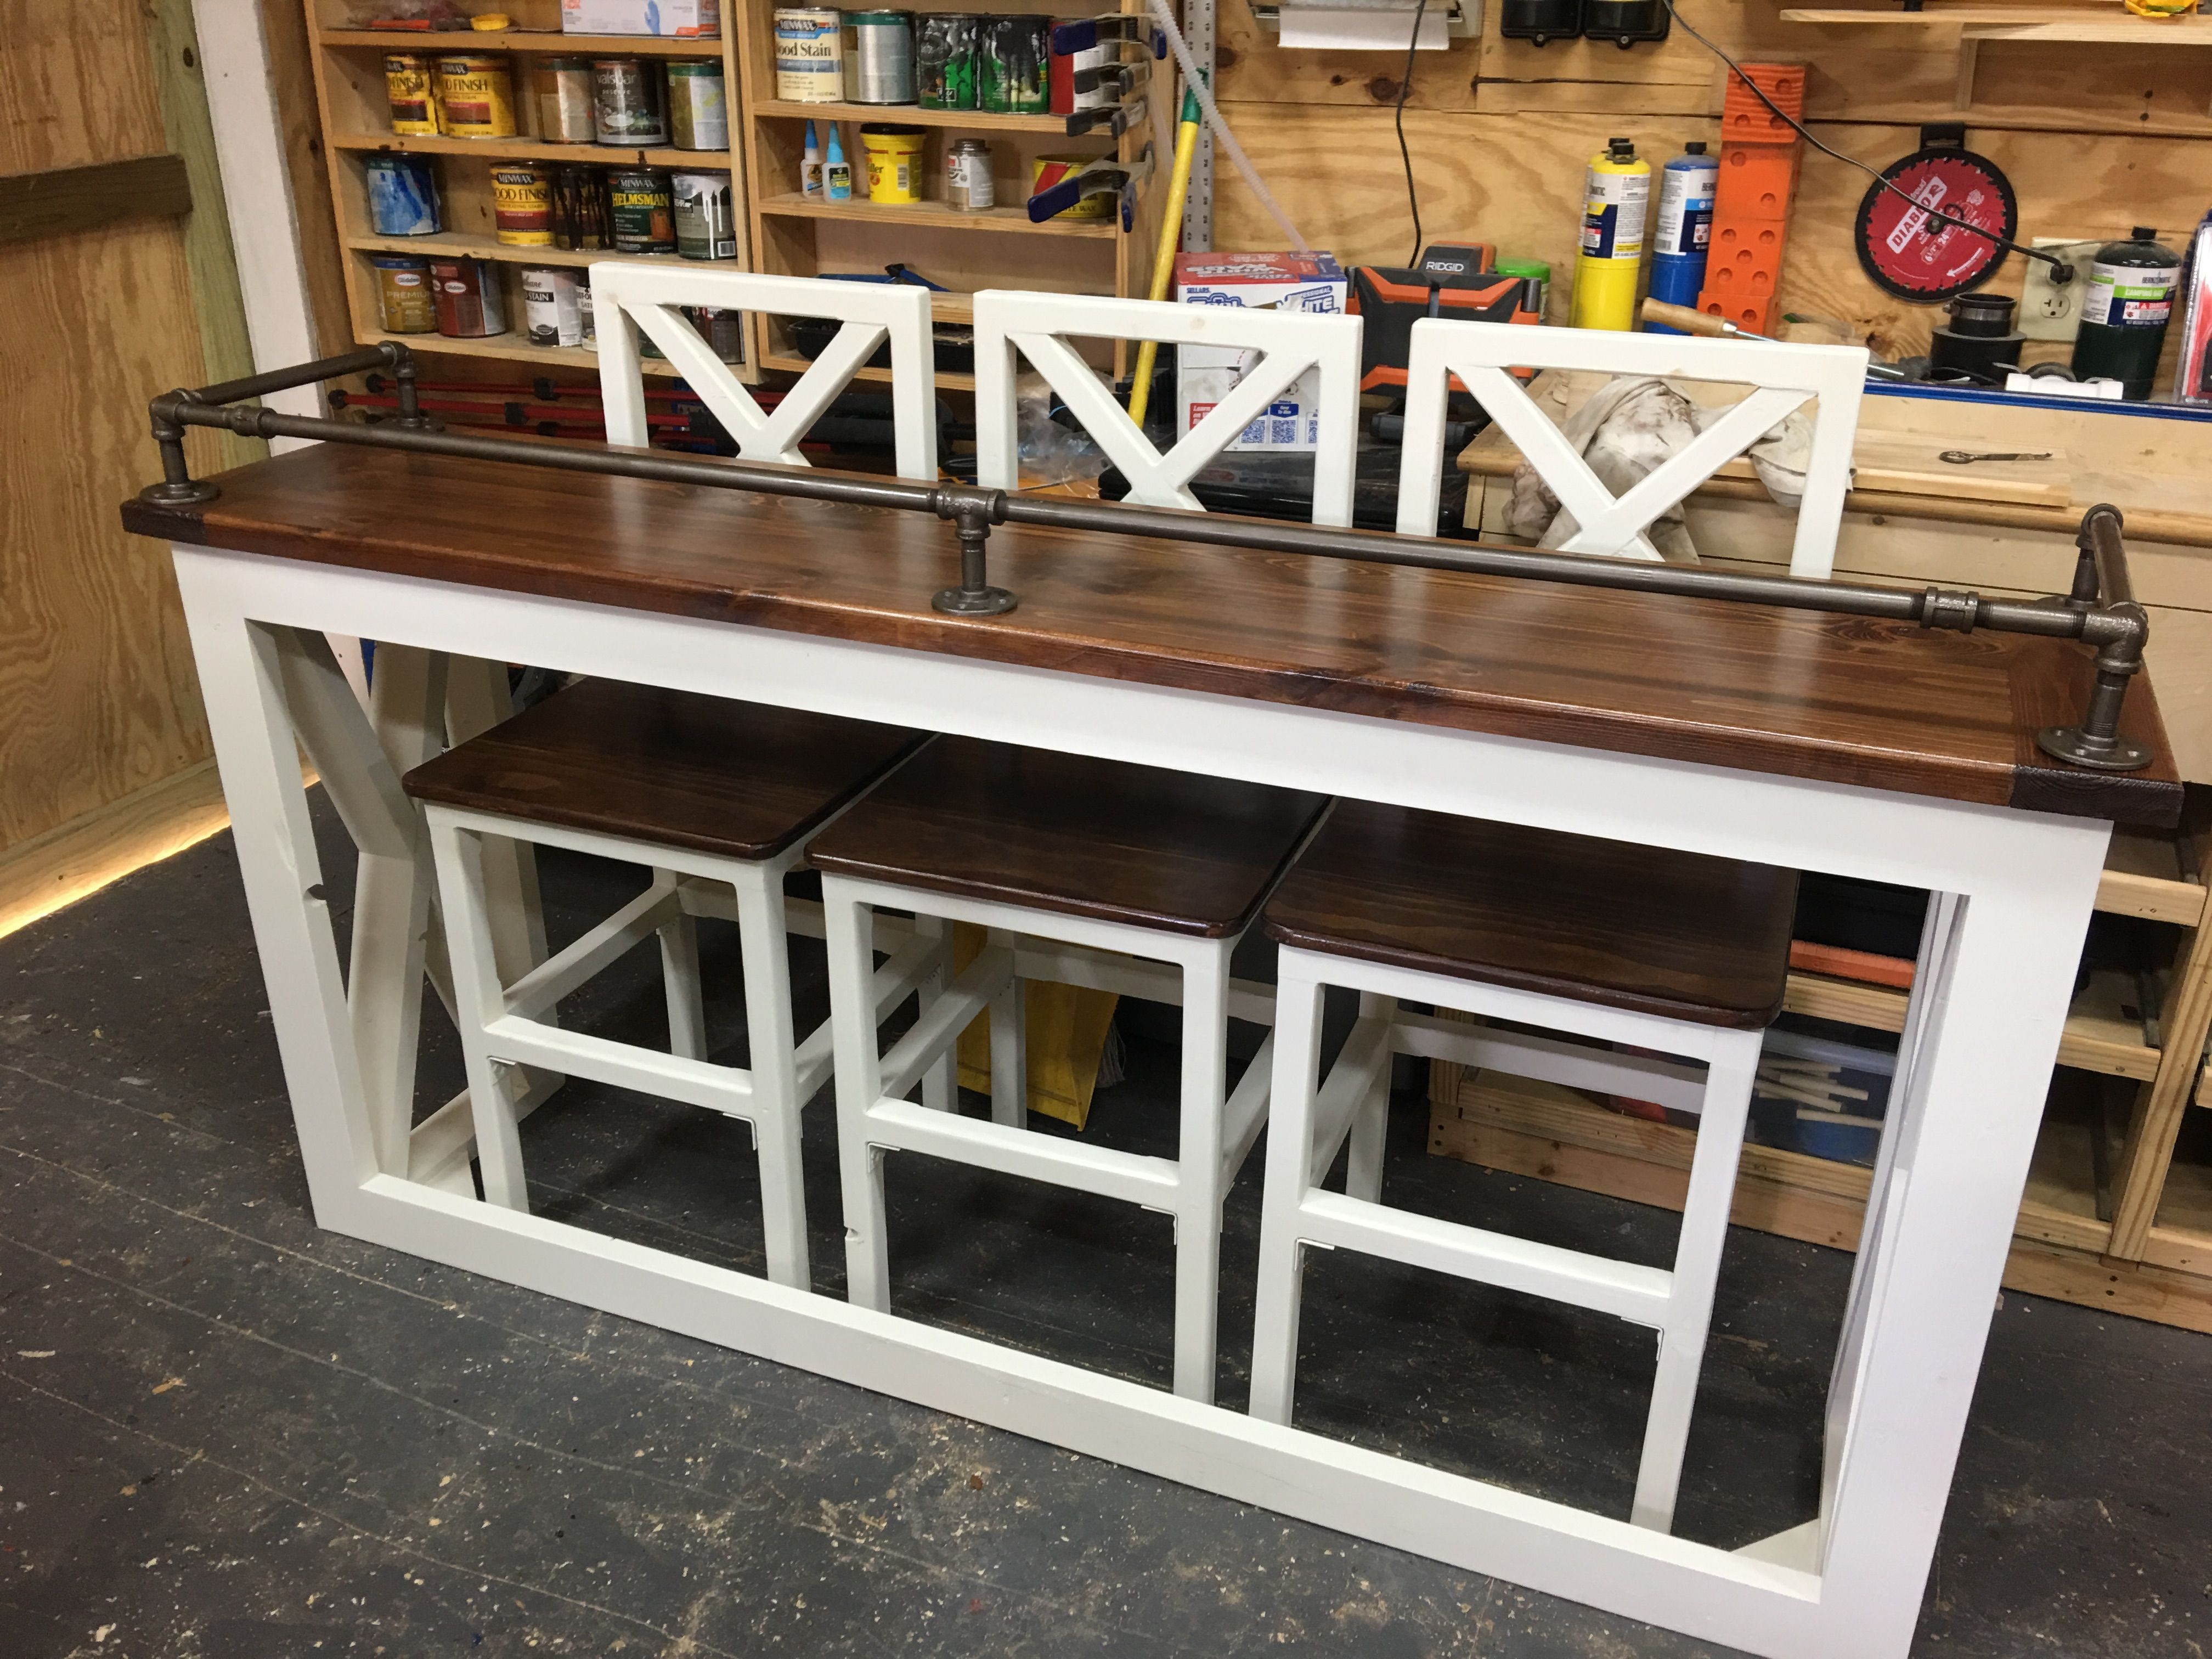 12 Wonderful Basement Storage Plans Ideas Home Bar Furniture Bar Top Tables Bar Furniture